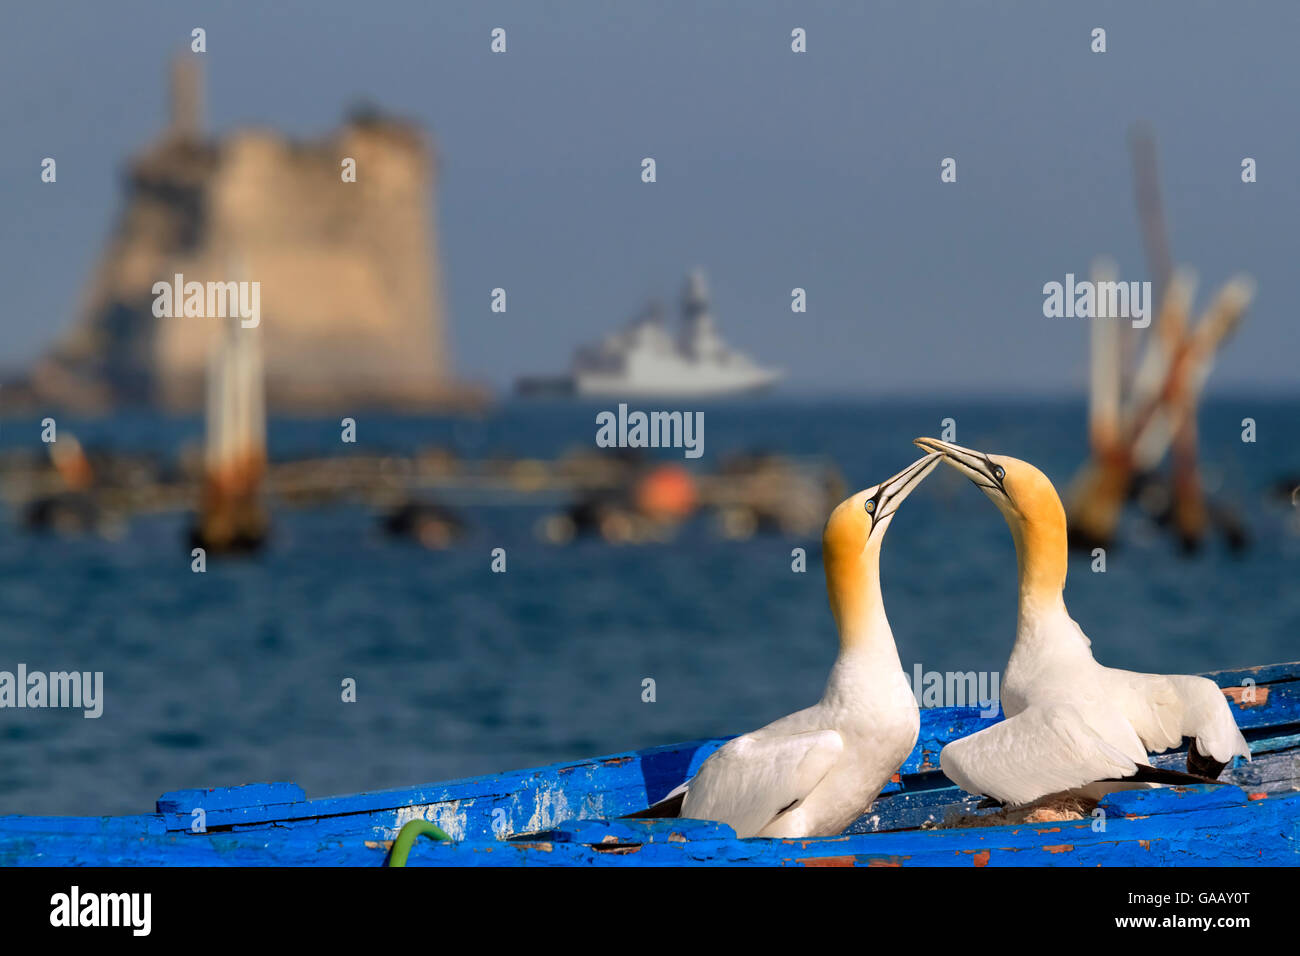 Gannets (Morus bassanus) courtship behavior on nest on abandoned boat, La Spezia Gulf, Italy. Mediterranean Sea. - Stock Image